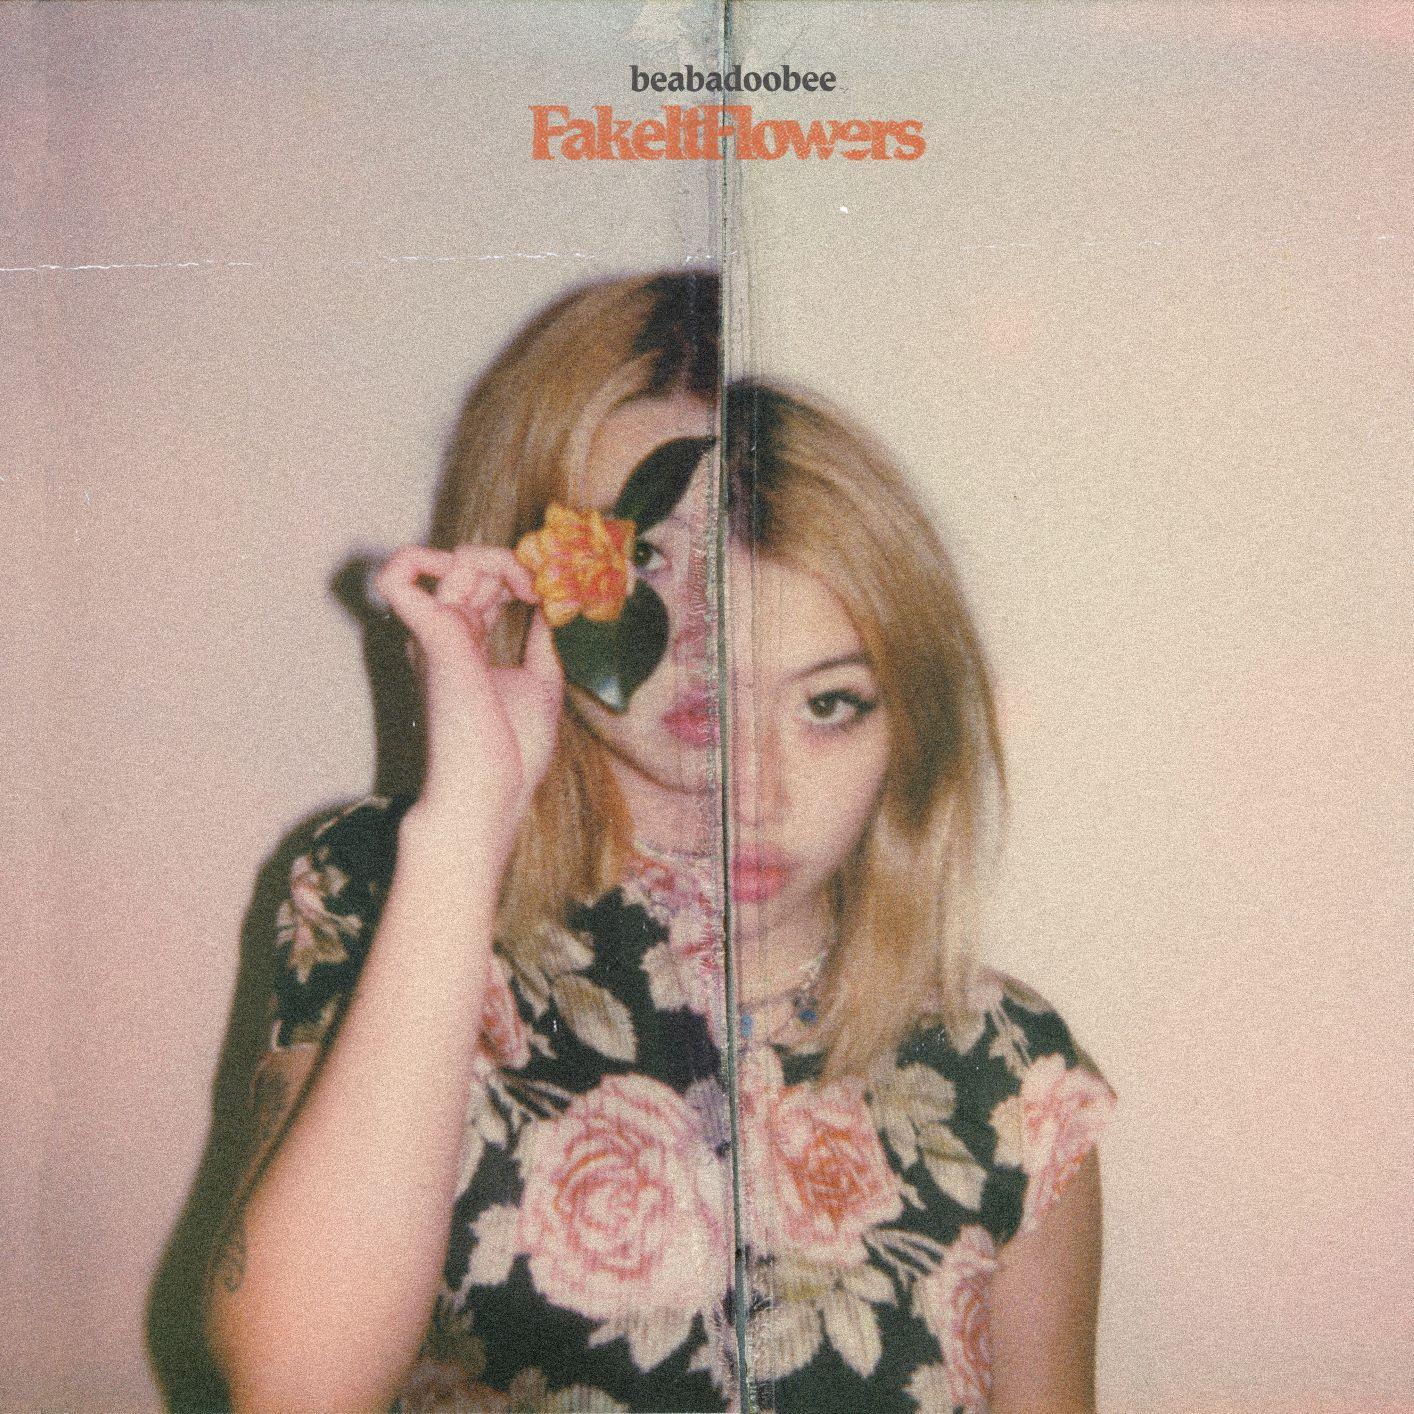 Beabadoobee - Fake It Flowers Album